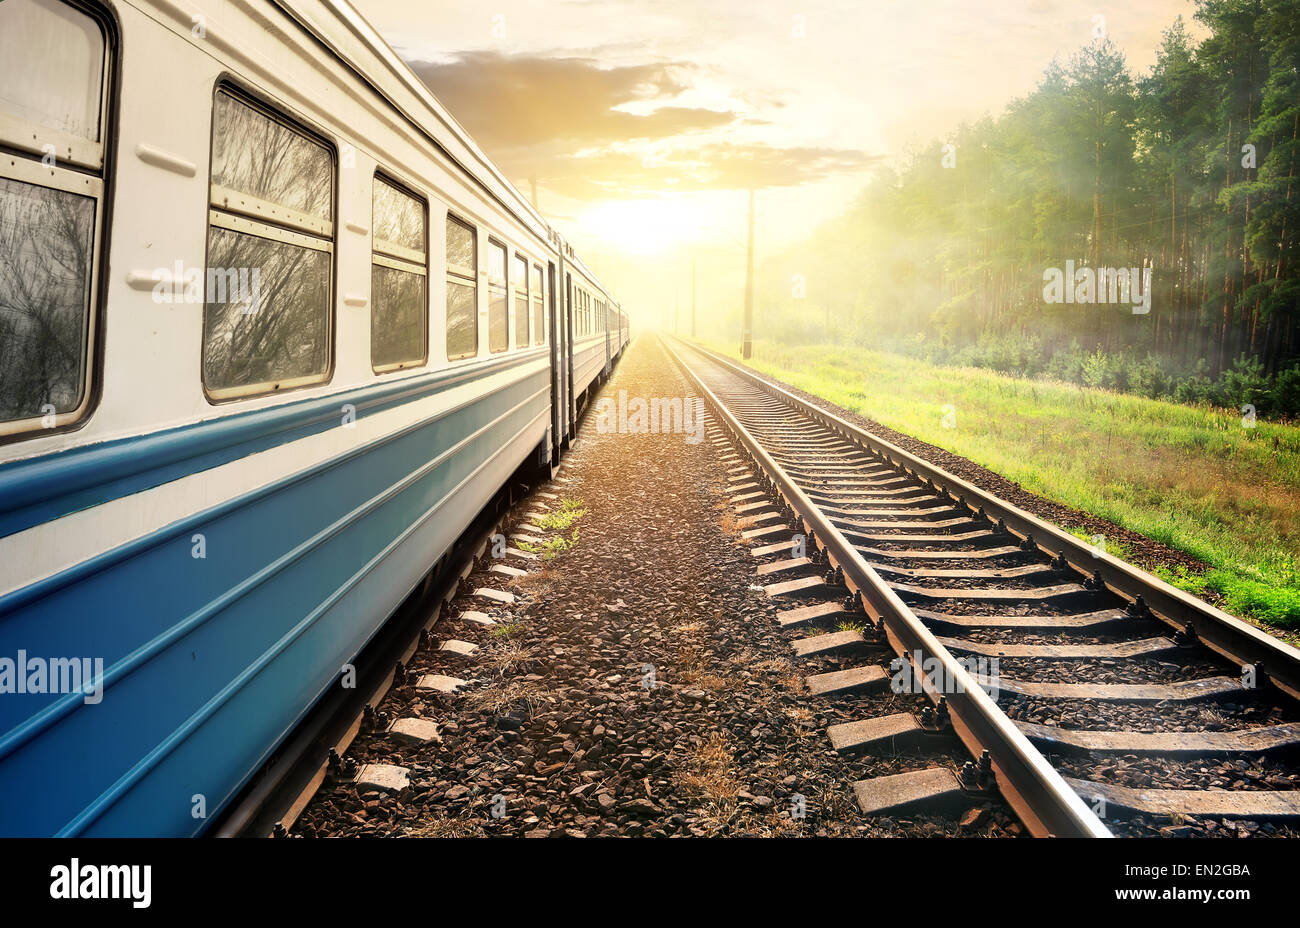 Zug durch den Pinienwald bei Sonnenuntergang bewegen Stockbild